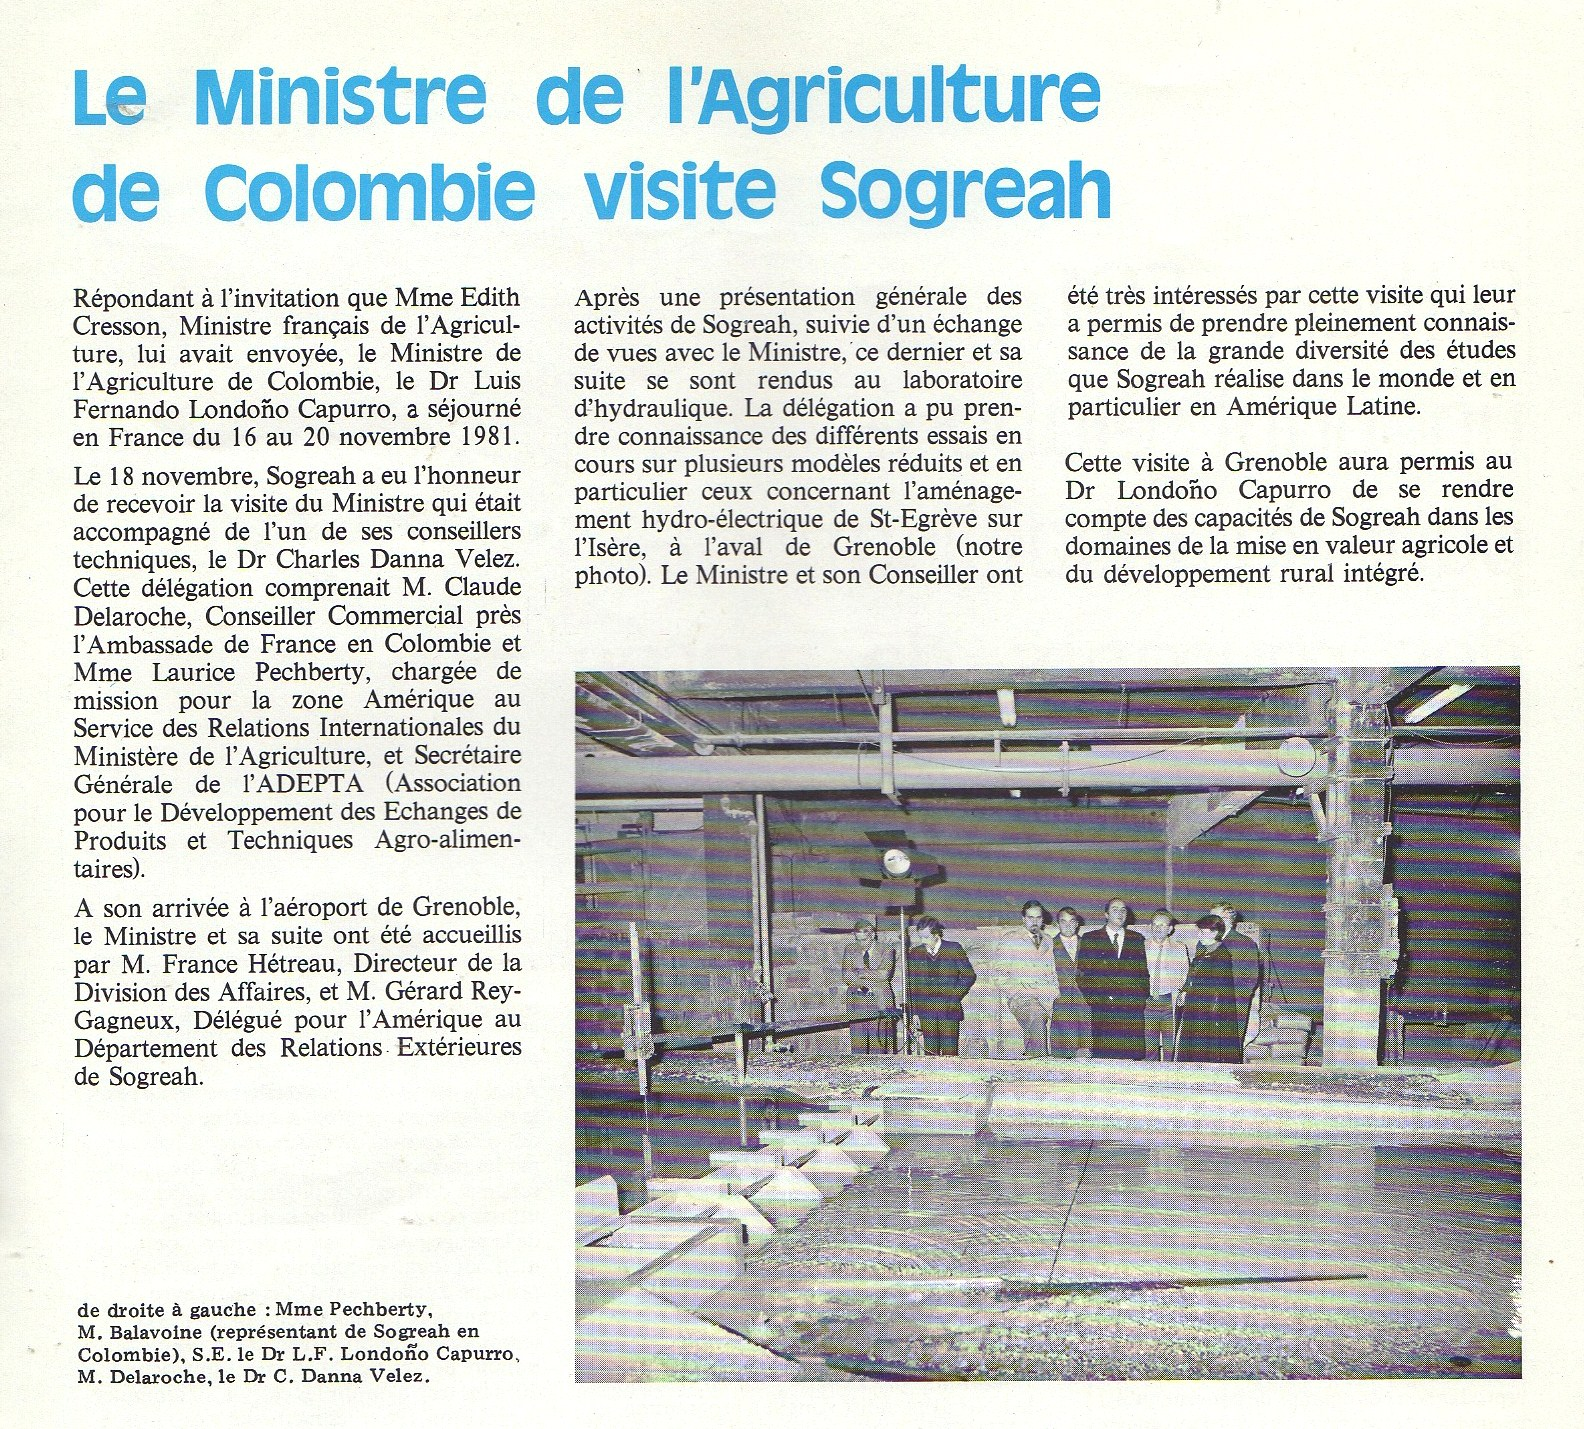 1981 visite ministre agri colombie